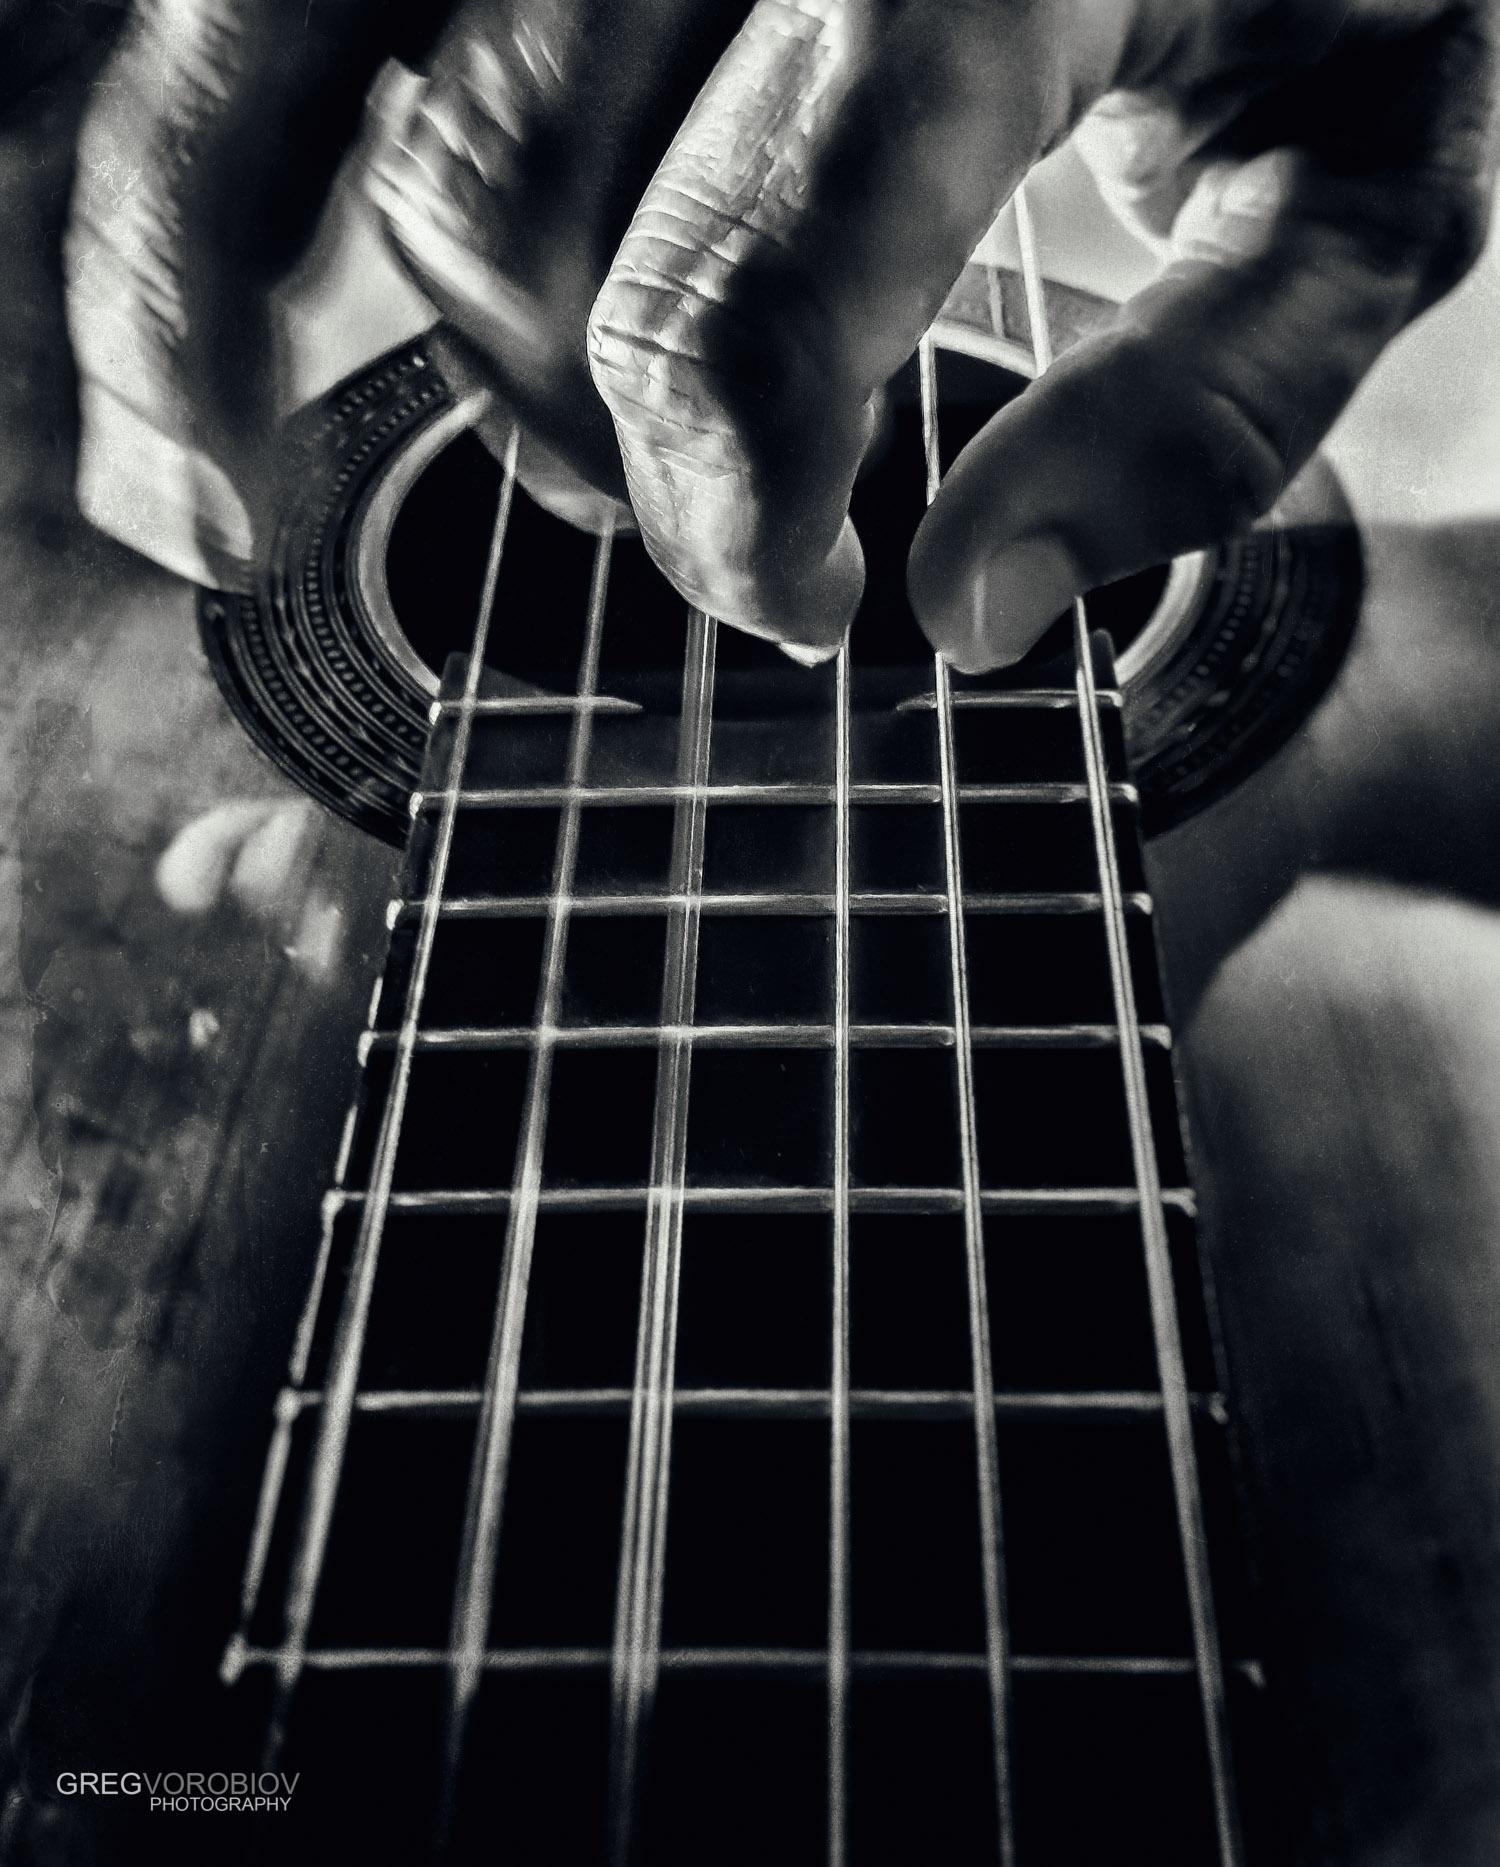 classical_guitar_hands_by_greg_vorobiov-1.jpg